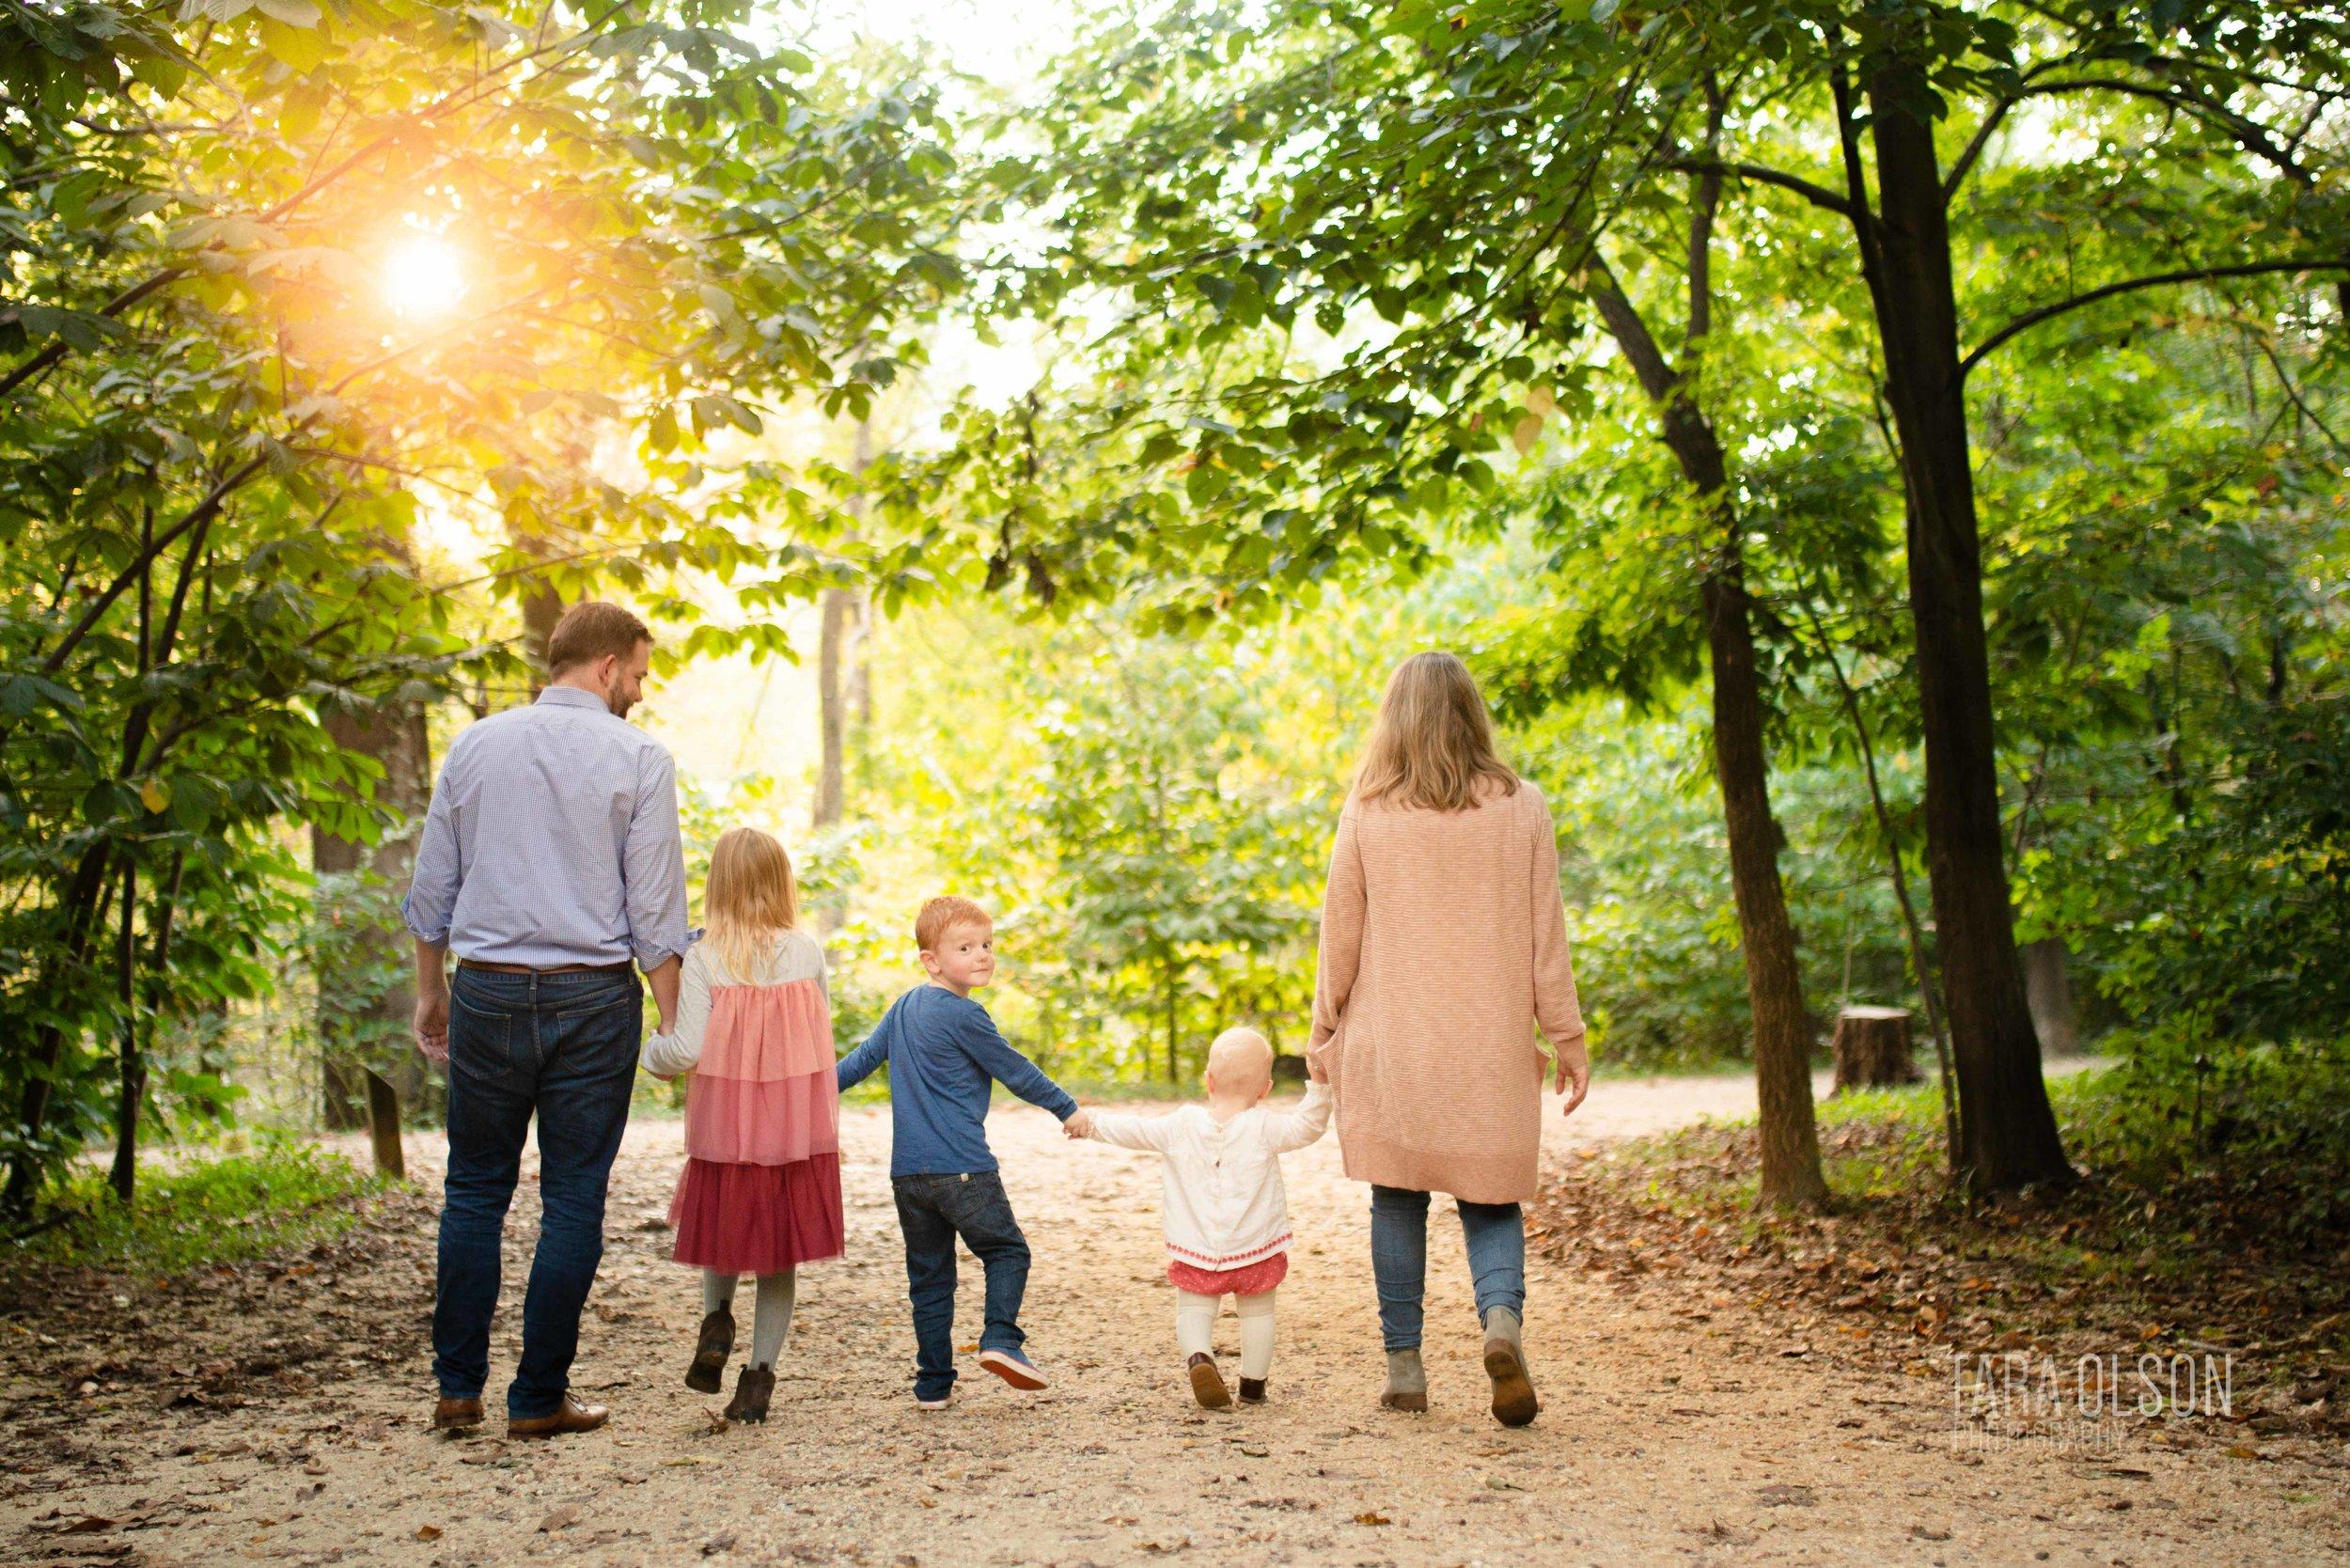 Hawkins_Arlington-Virginia-Family-Photographer_Tara-Olson-Photography_4291.jpg